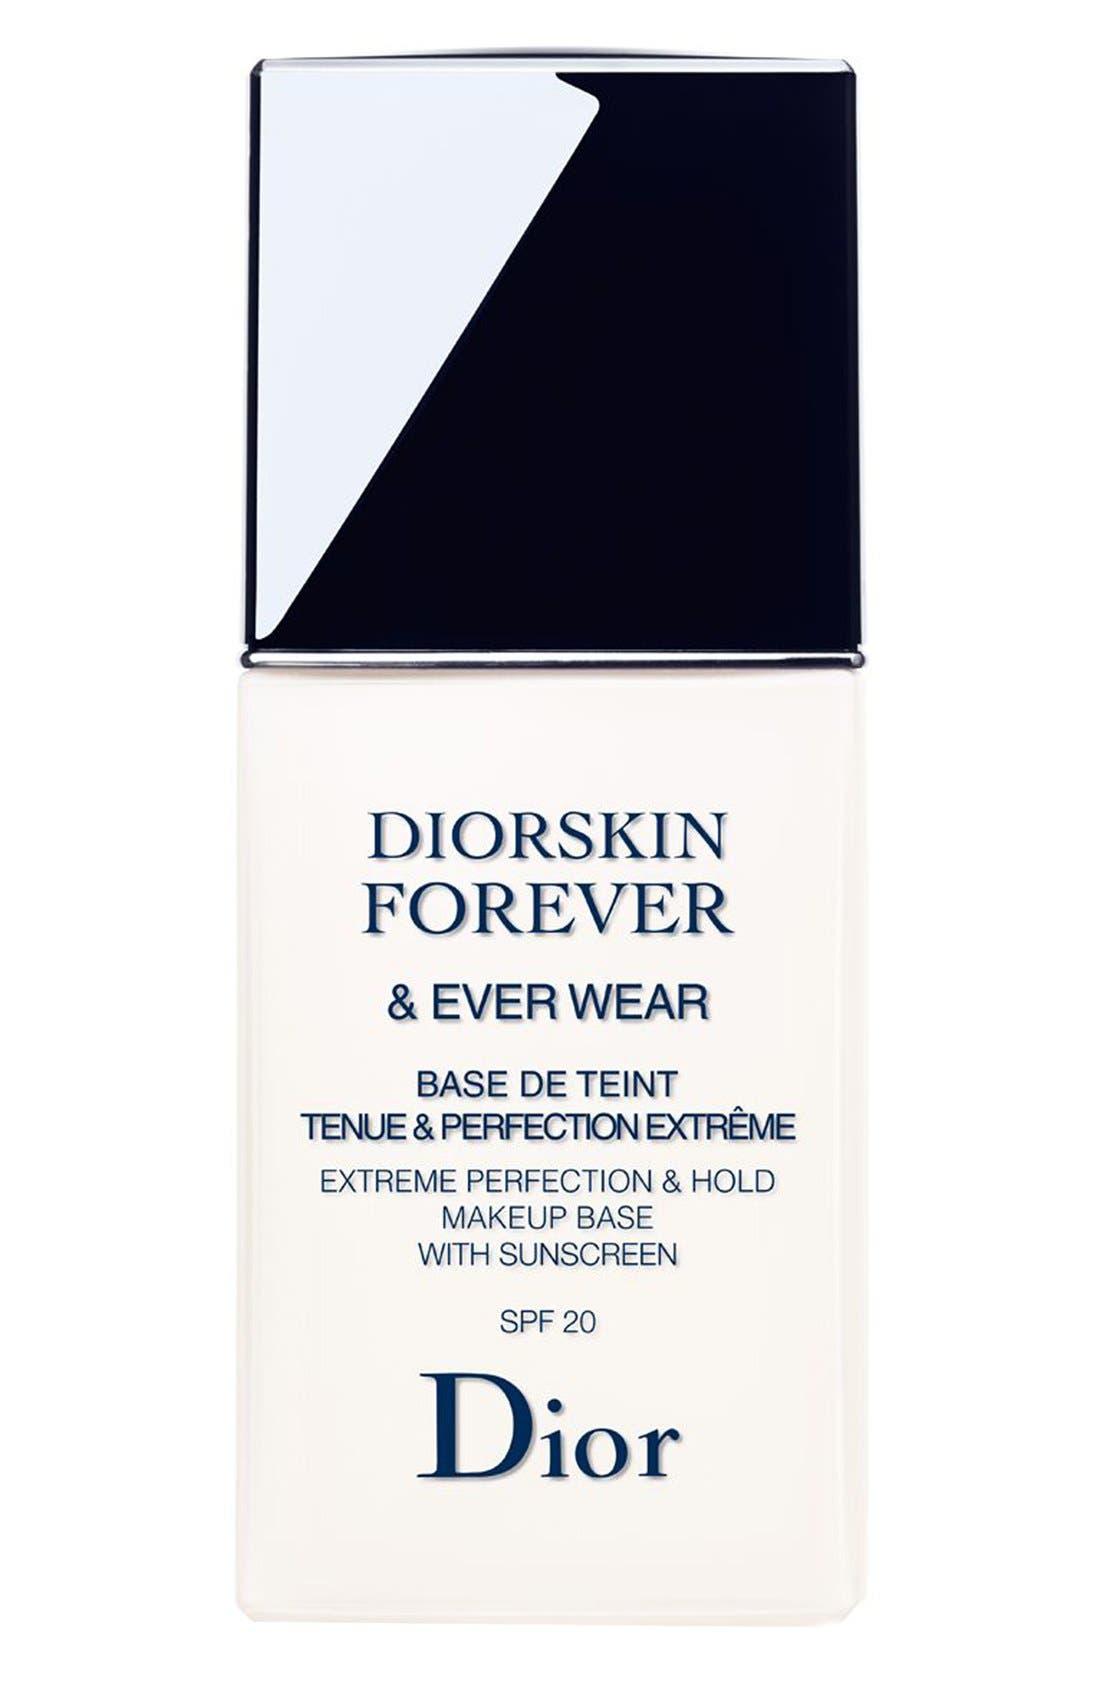 Diorskin Forever & Ever Wear Makeup Primer SPF 20,                             Main thumbnail 1, color,                             NO COLOR